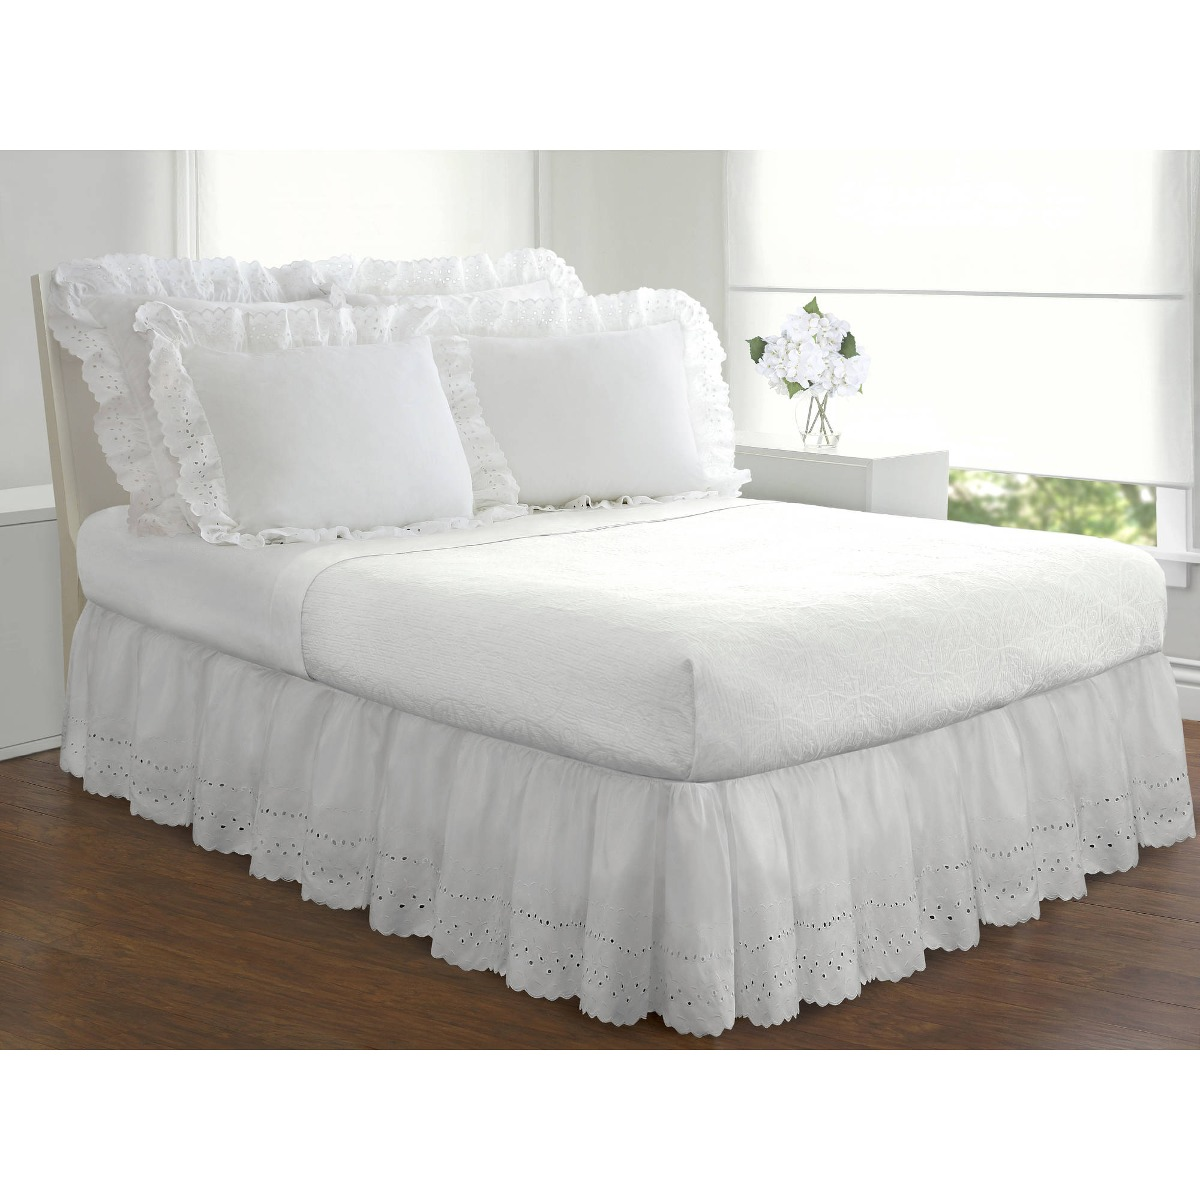 Autor ojete volantes falda de cama ropa de cama 187 - Ropa de cama zaragoza ...